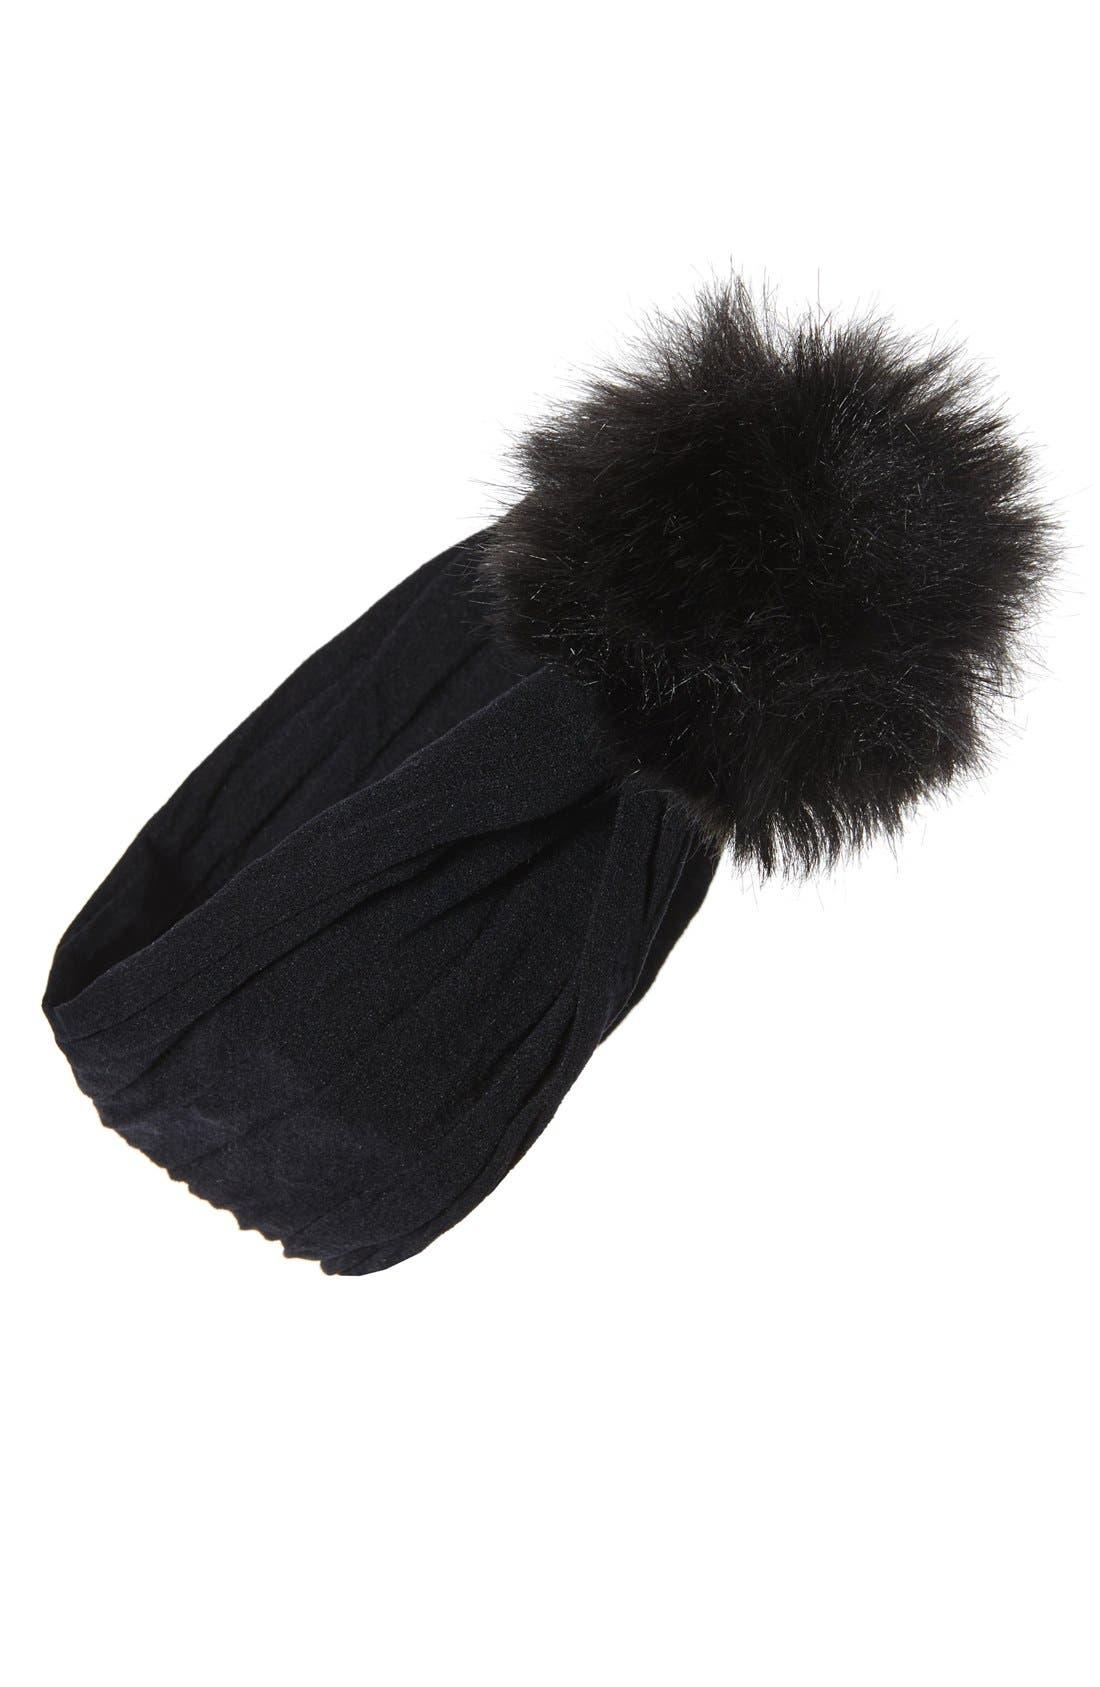 Faux Fur Pompom Headband,                             Main thumbnail 1, color,                             Black